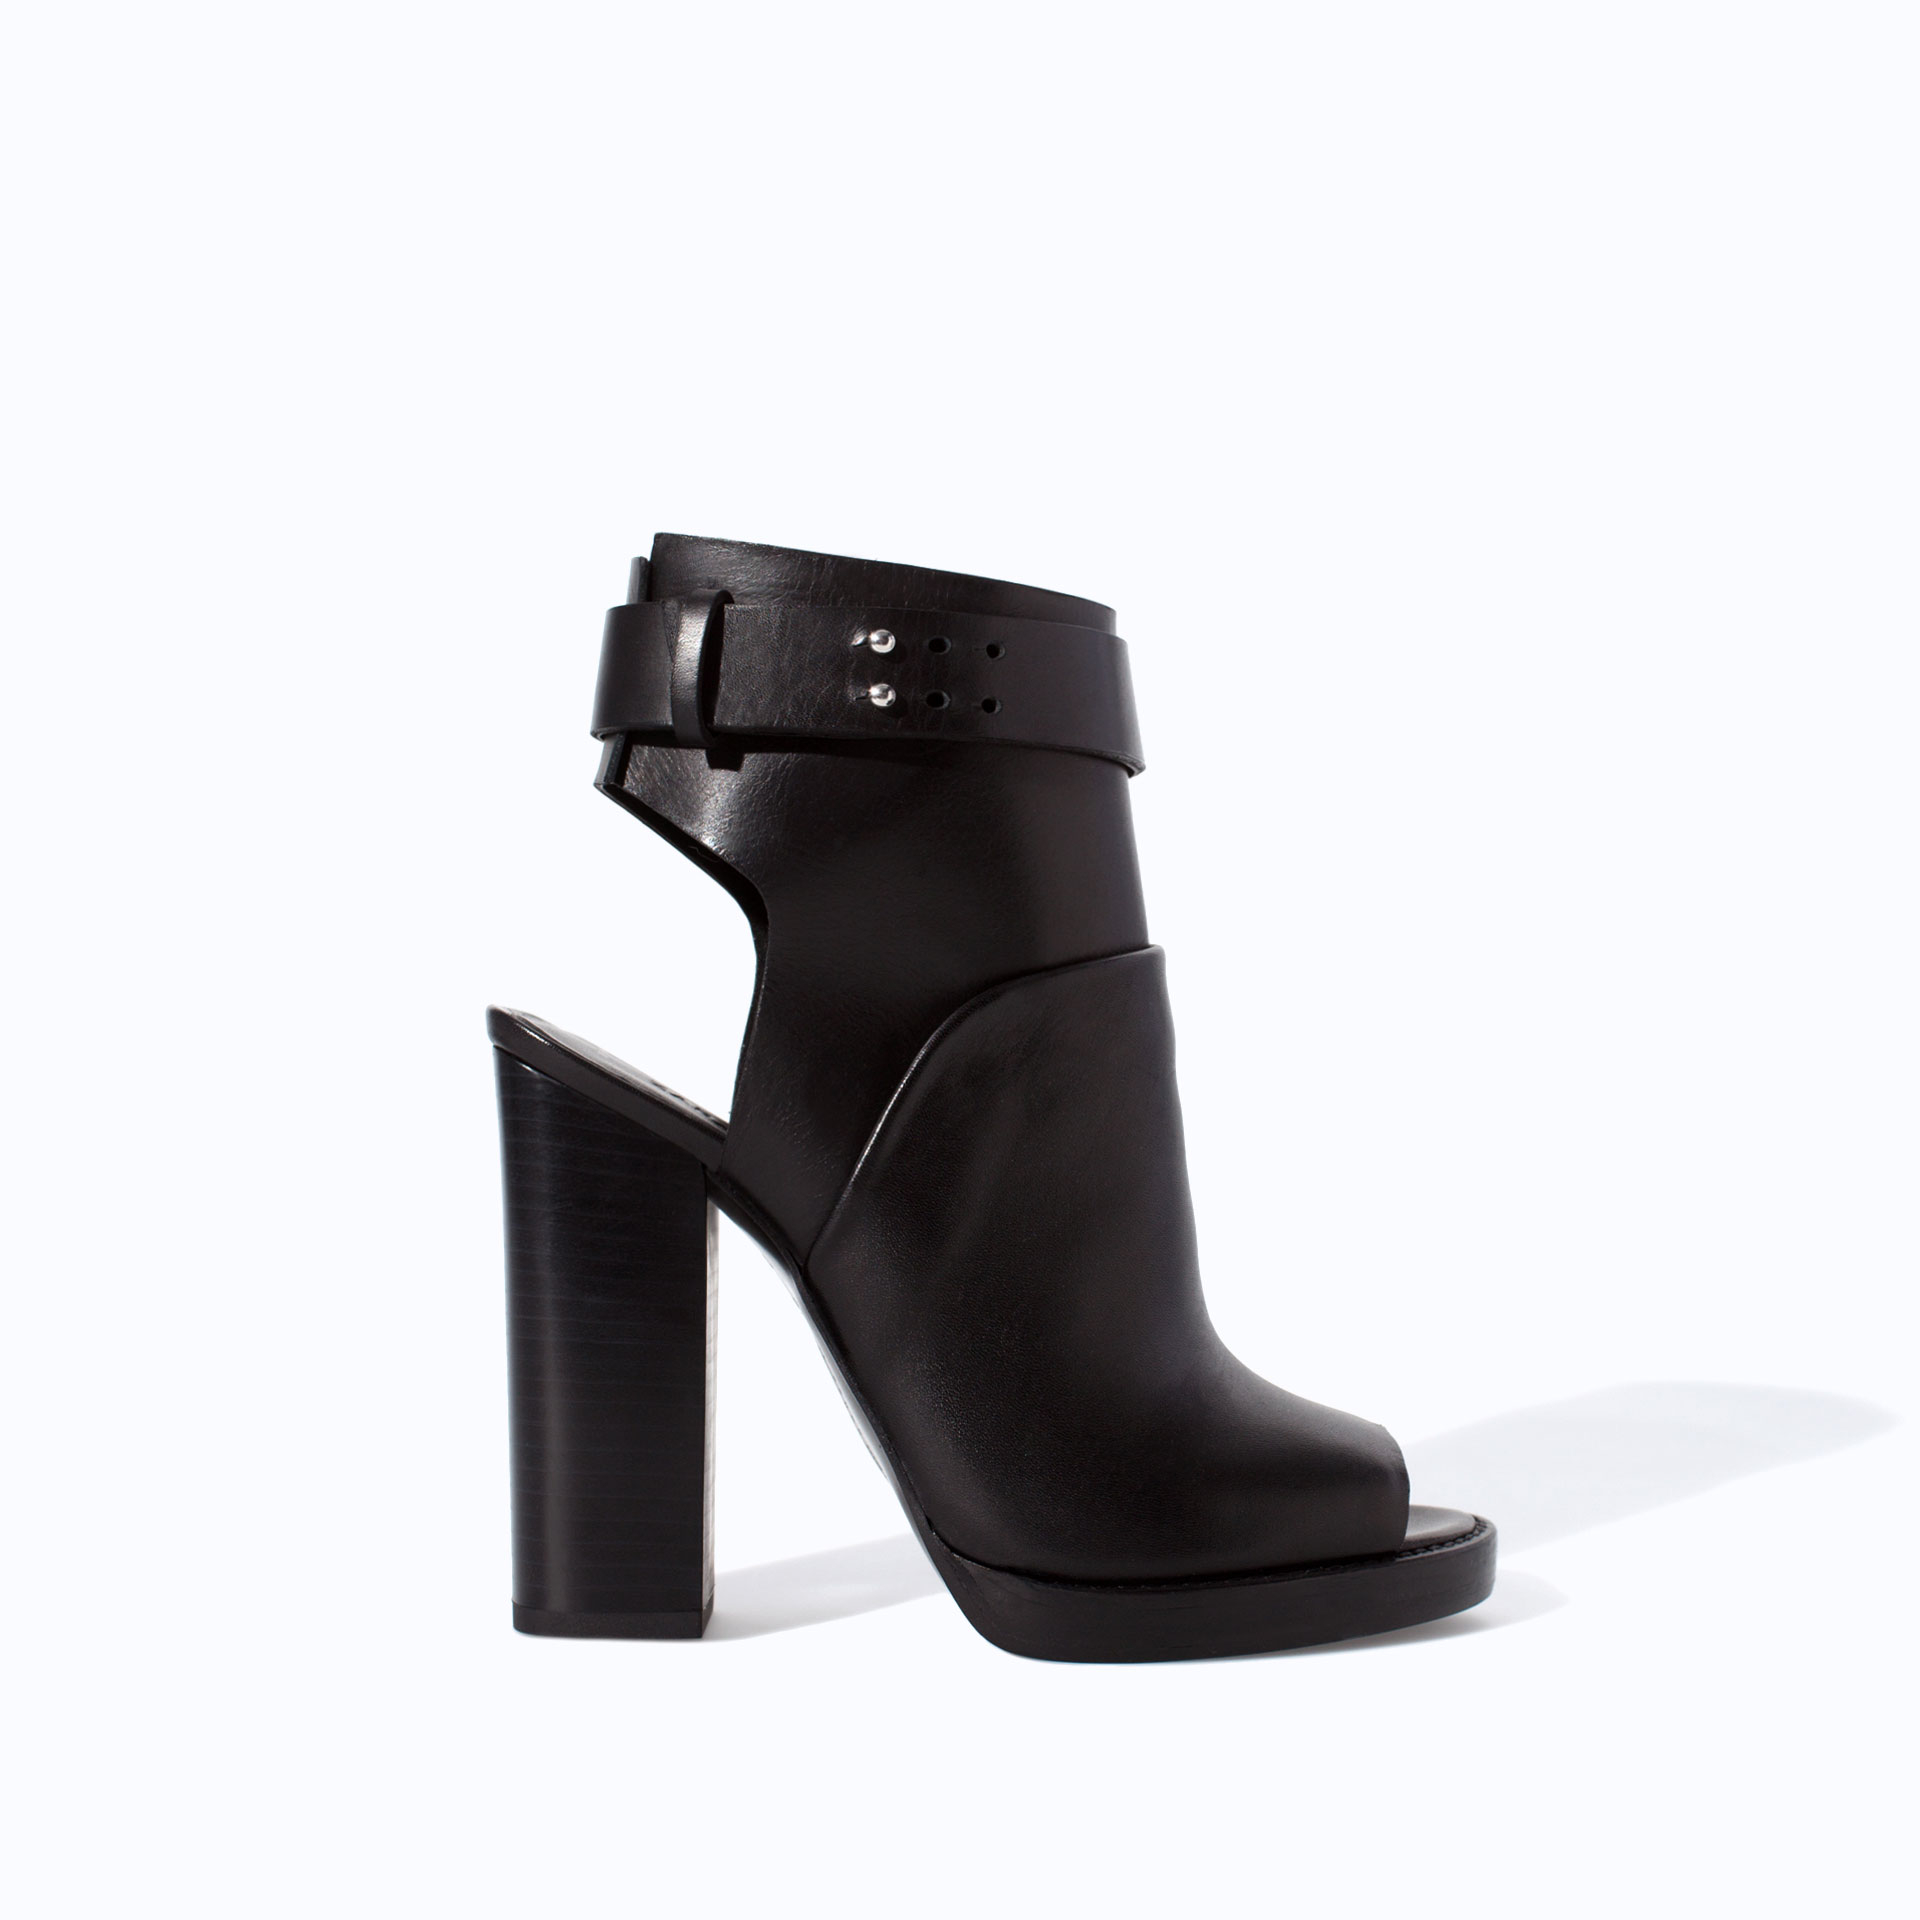 Peep Toe Ankle Boots U2013 The Cutest The Prettiest U2013 Carey Fashion